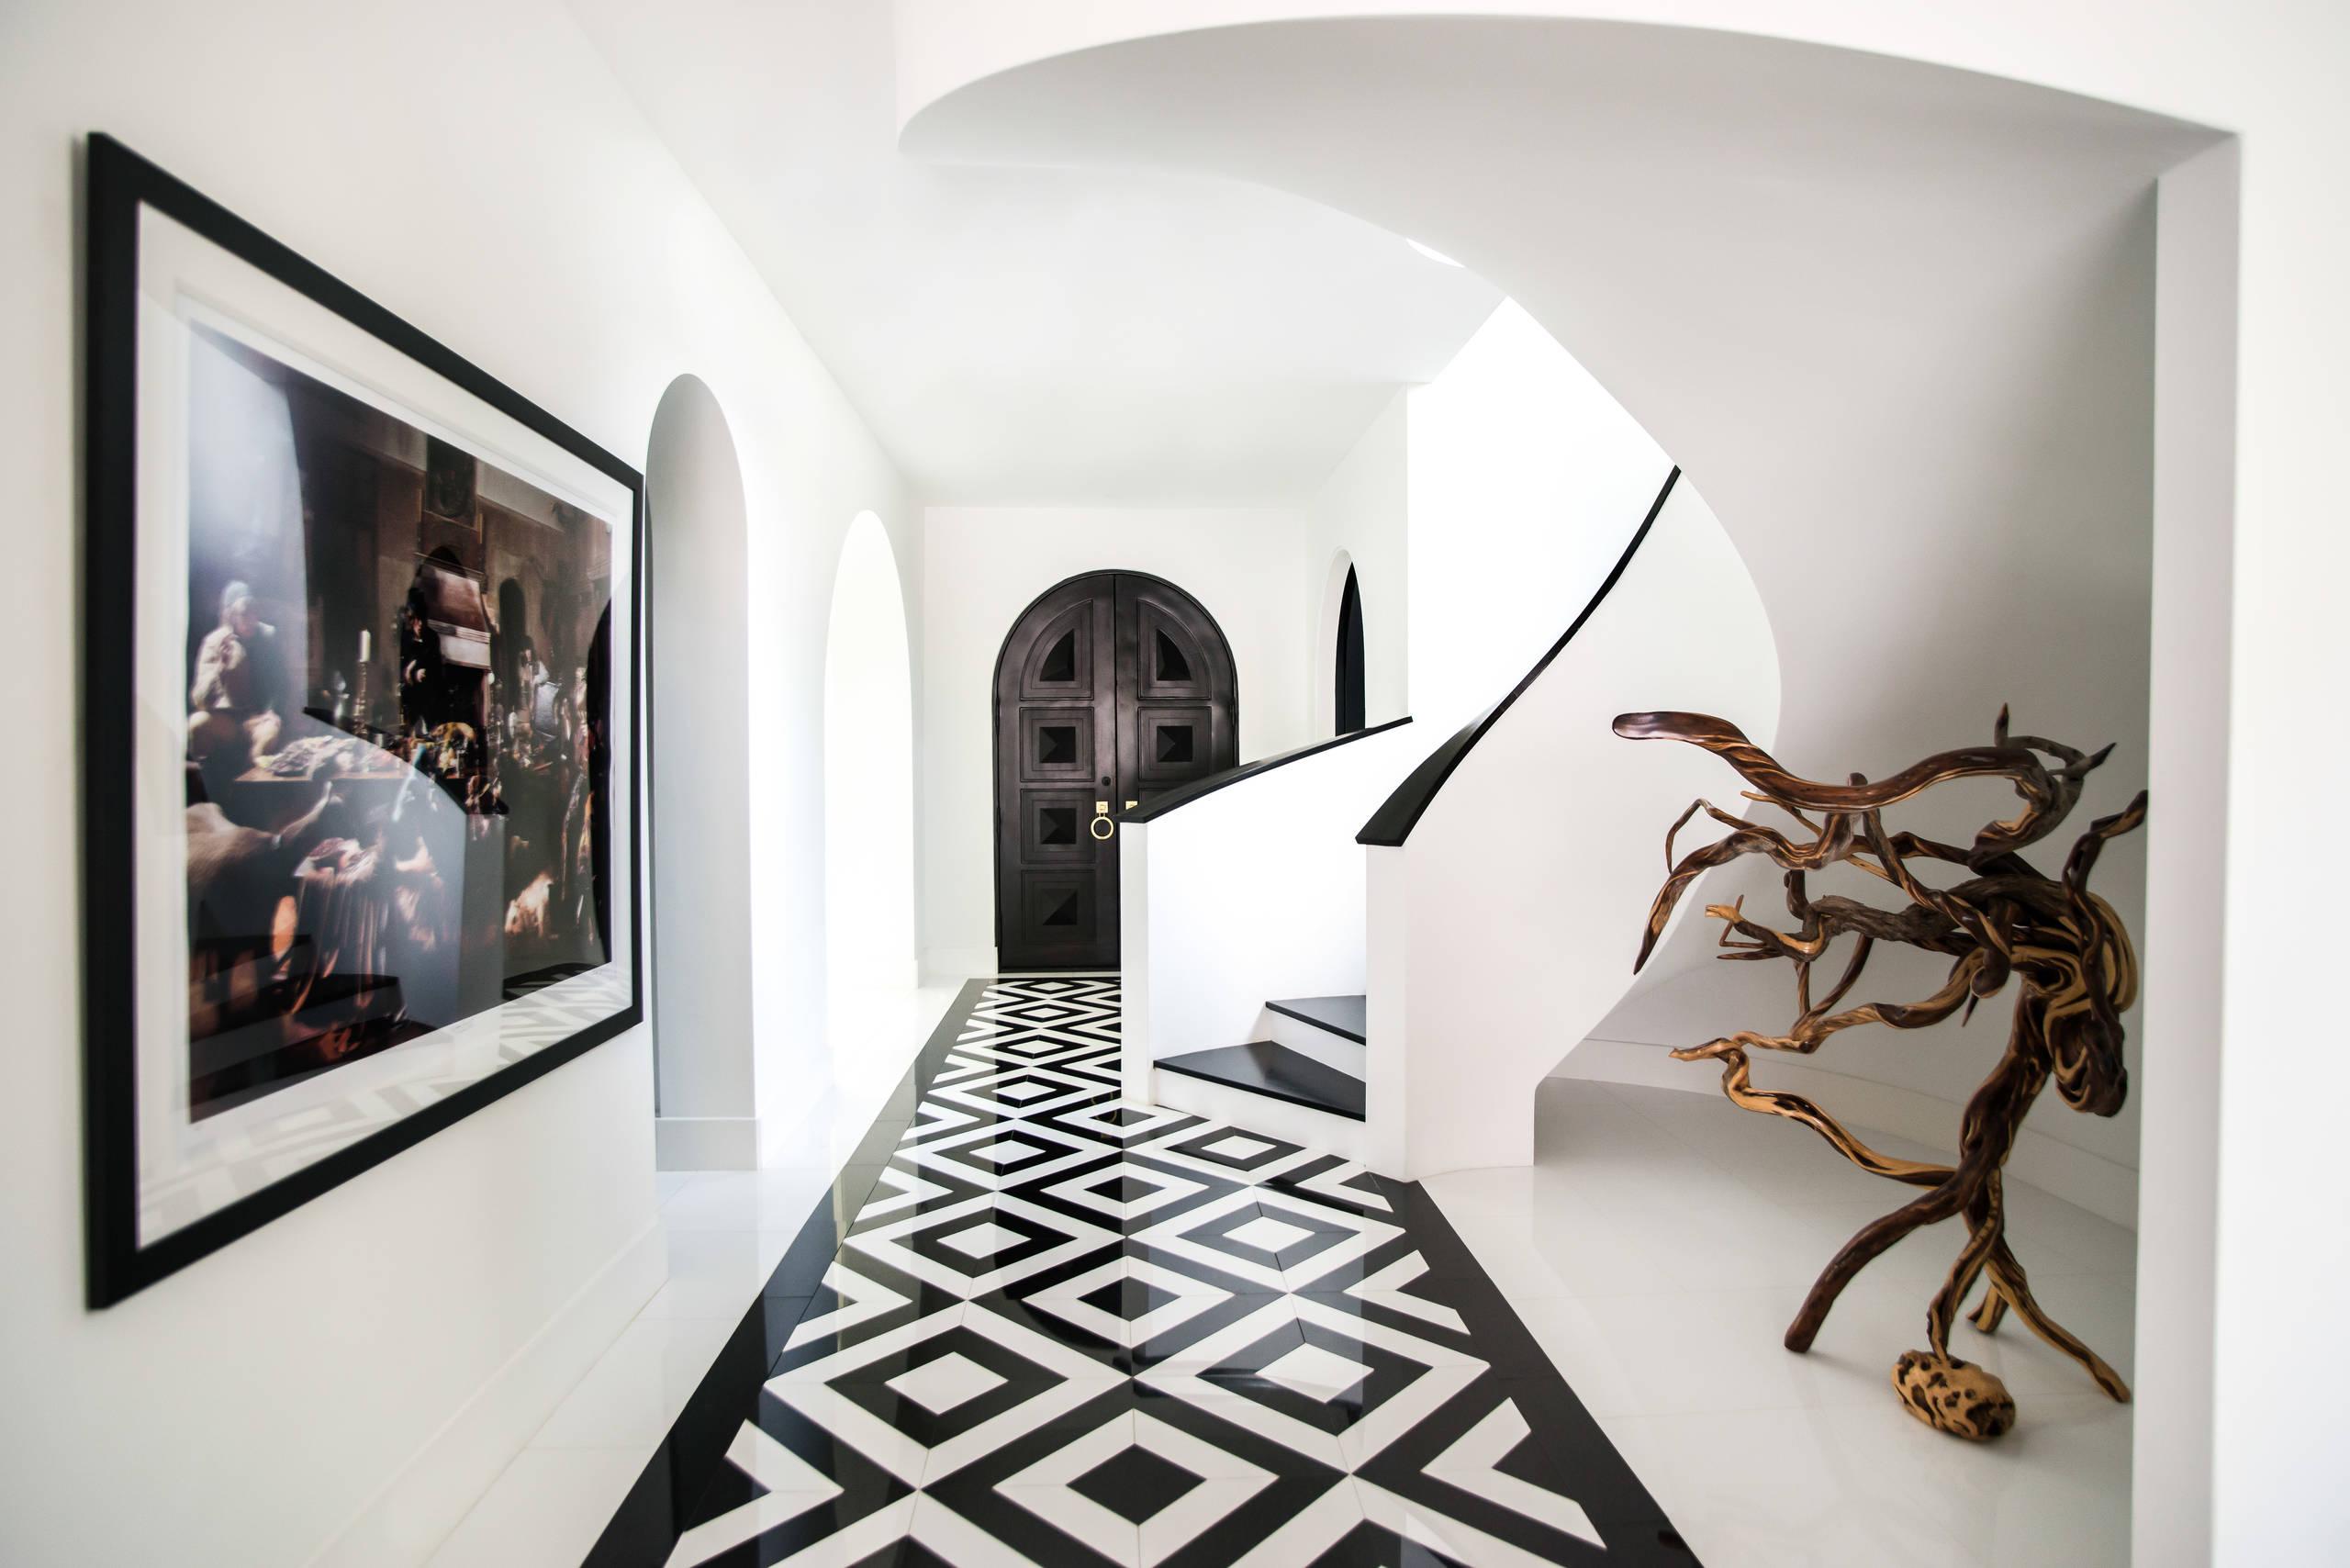 75 Beautiful Marble Floor Hallway Pictures & Ideas - August, 2021 | Houzz